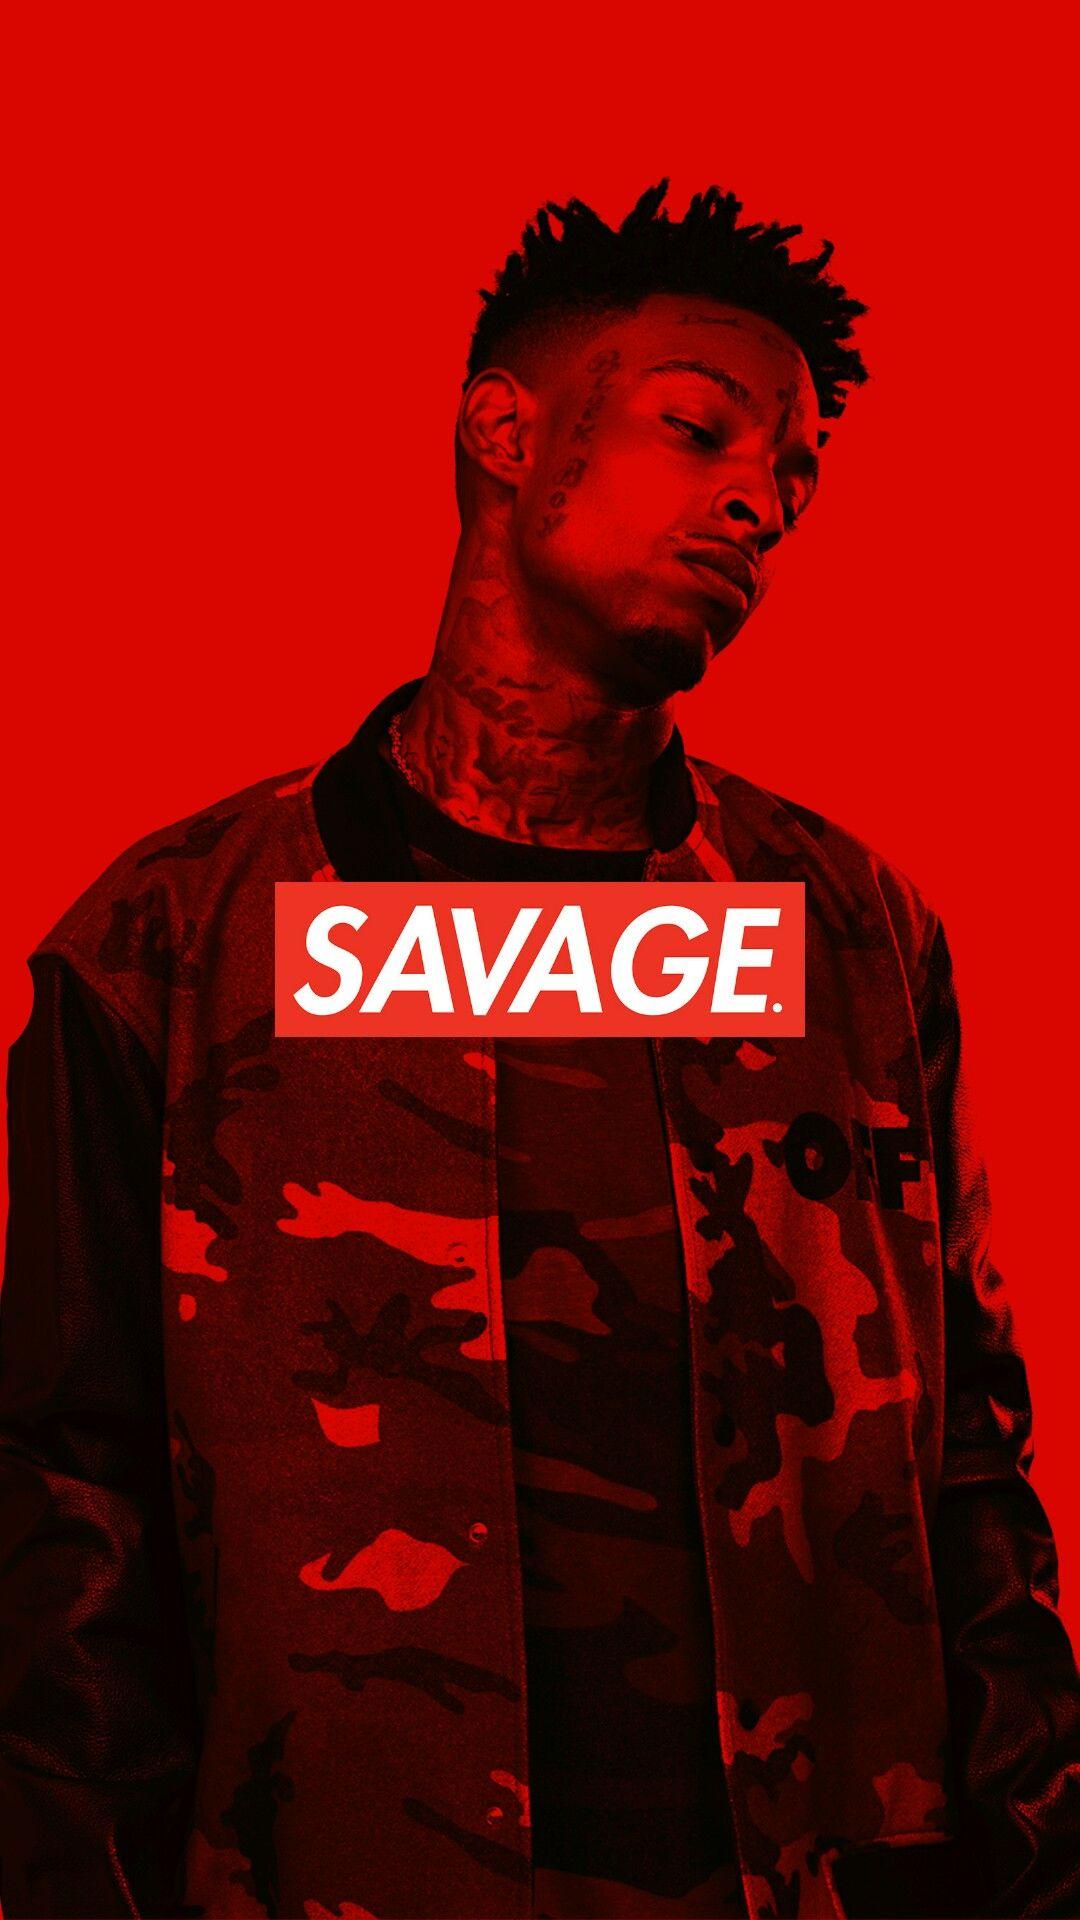 21 Savage IPhone Wallpaper Savage box logo Sfondi Sfondi per 1080x1920